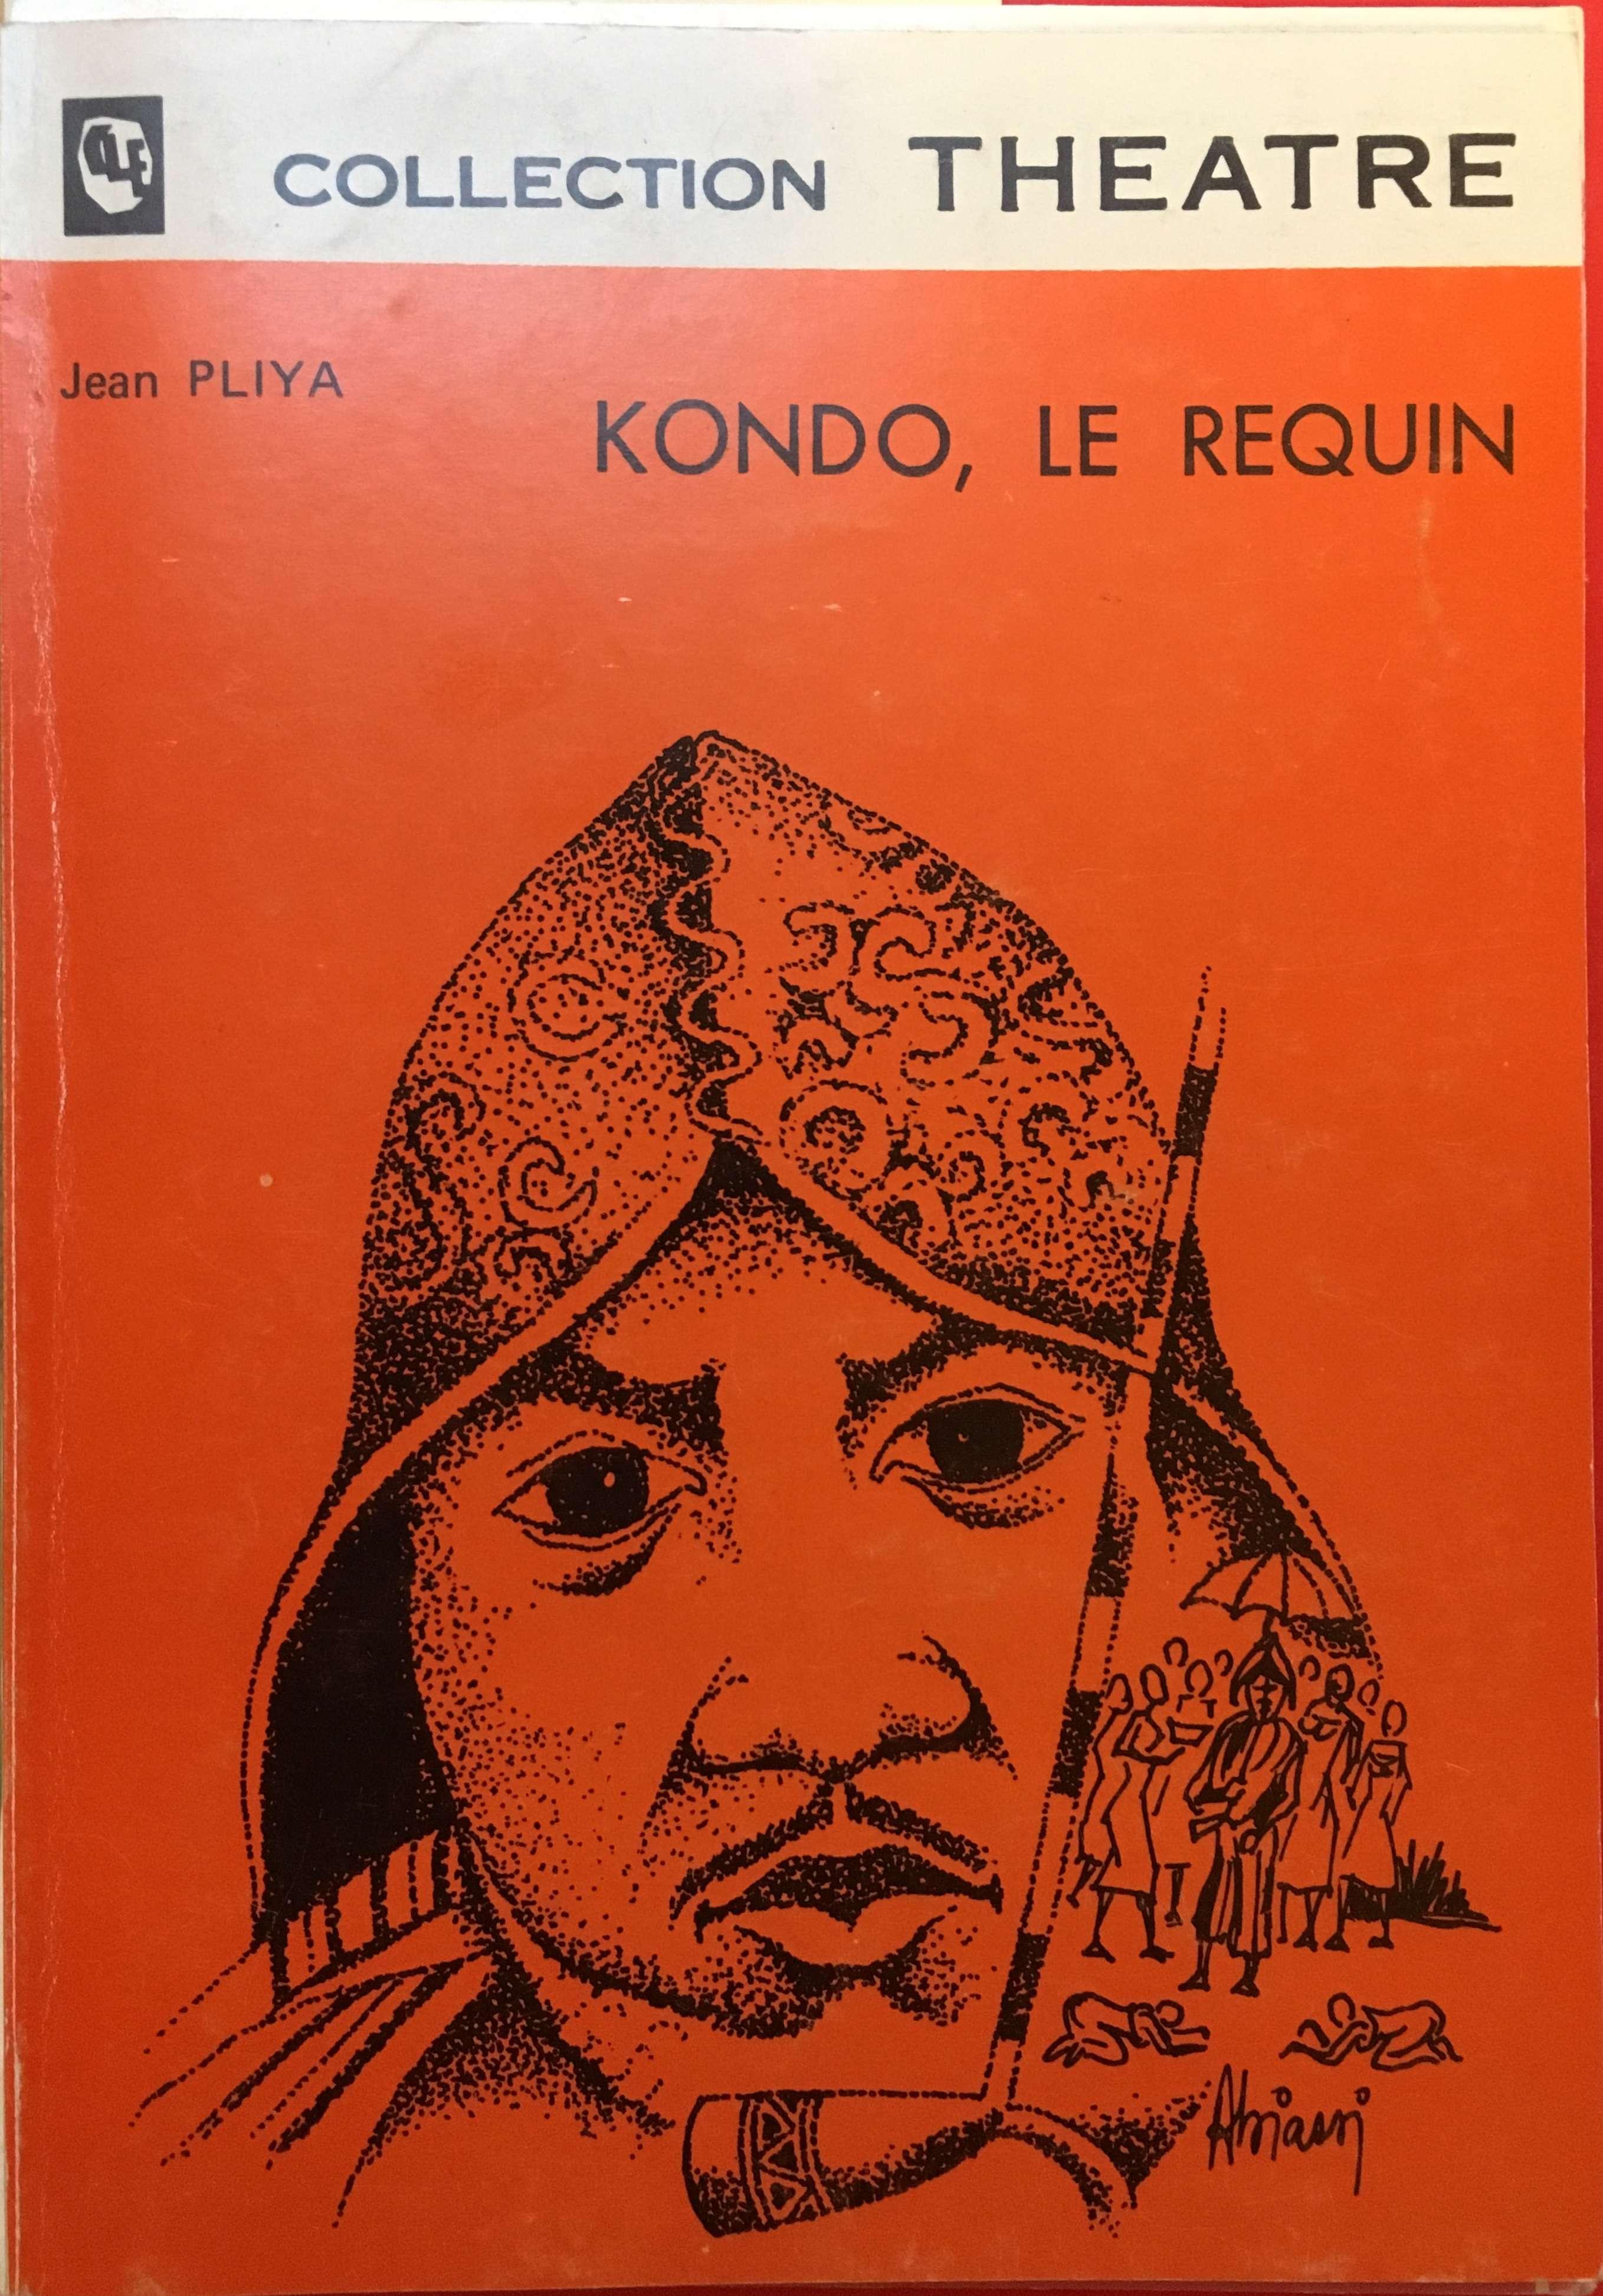 Kondo, le requin, Pliya, Jean